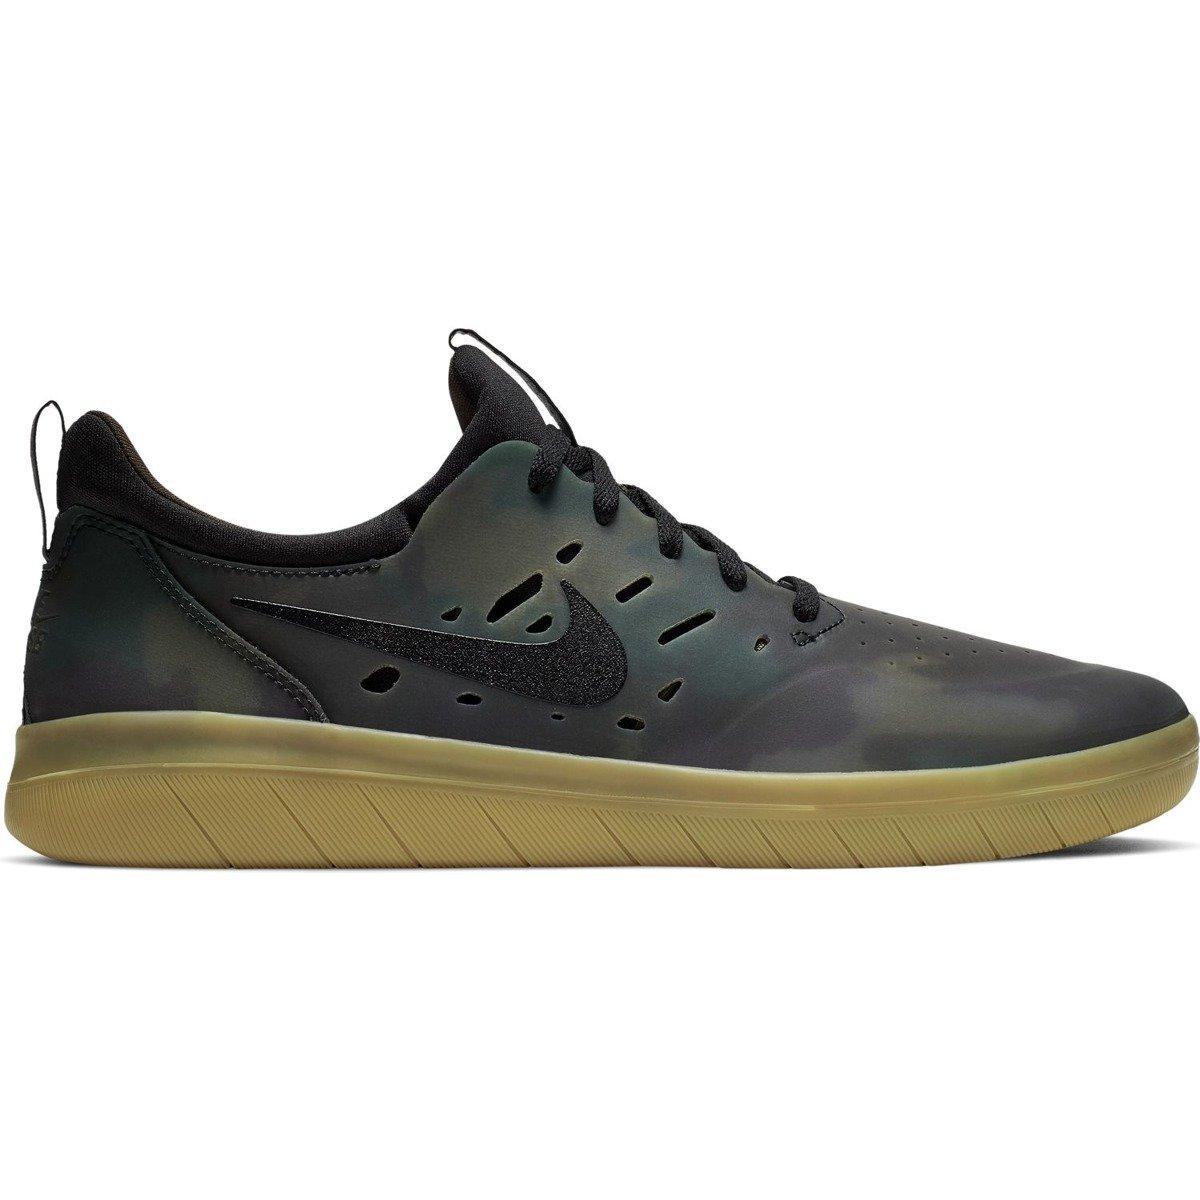 buty Nike Sb Nyjah Free Premium Multi colorblack gum Light Brown